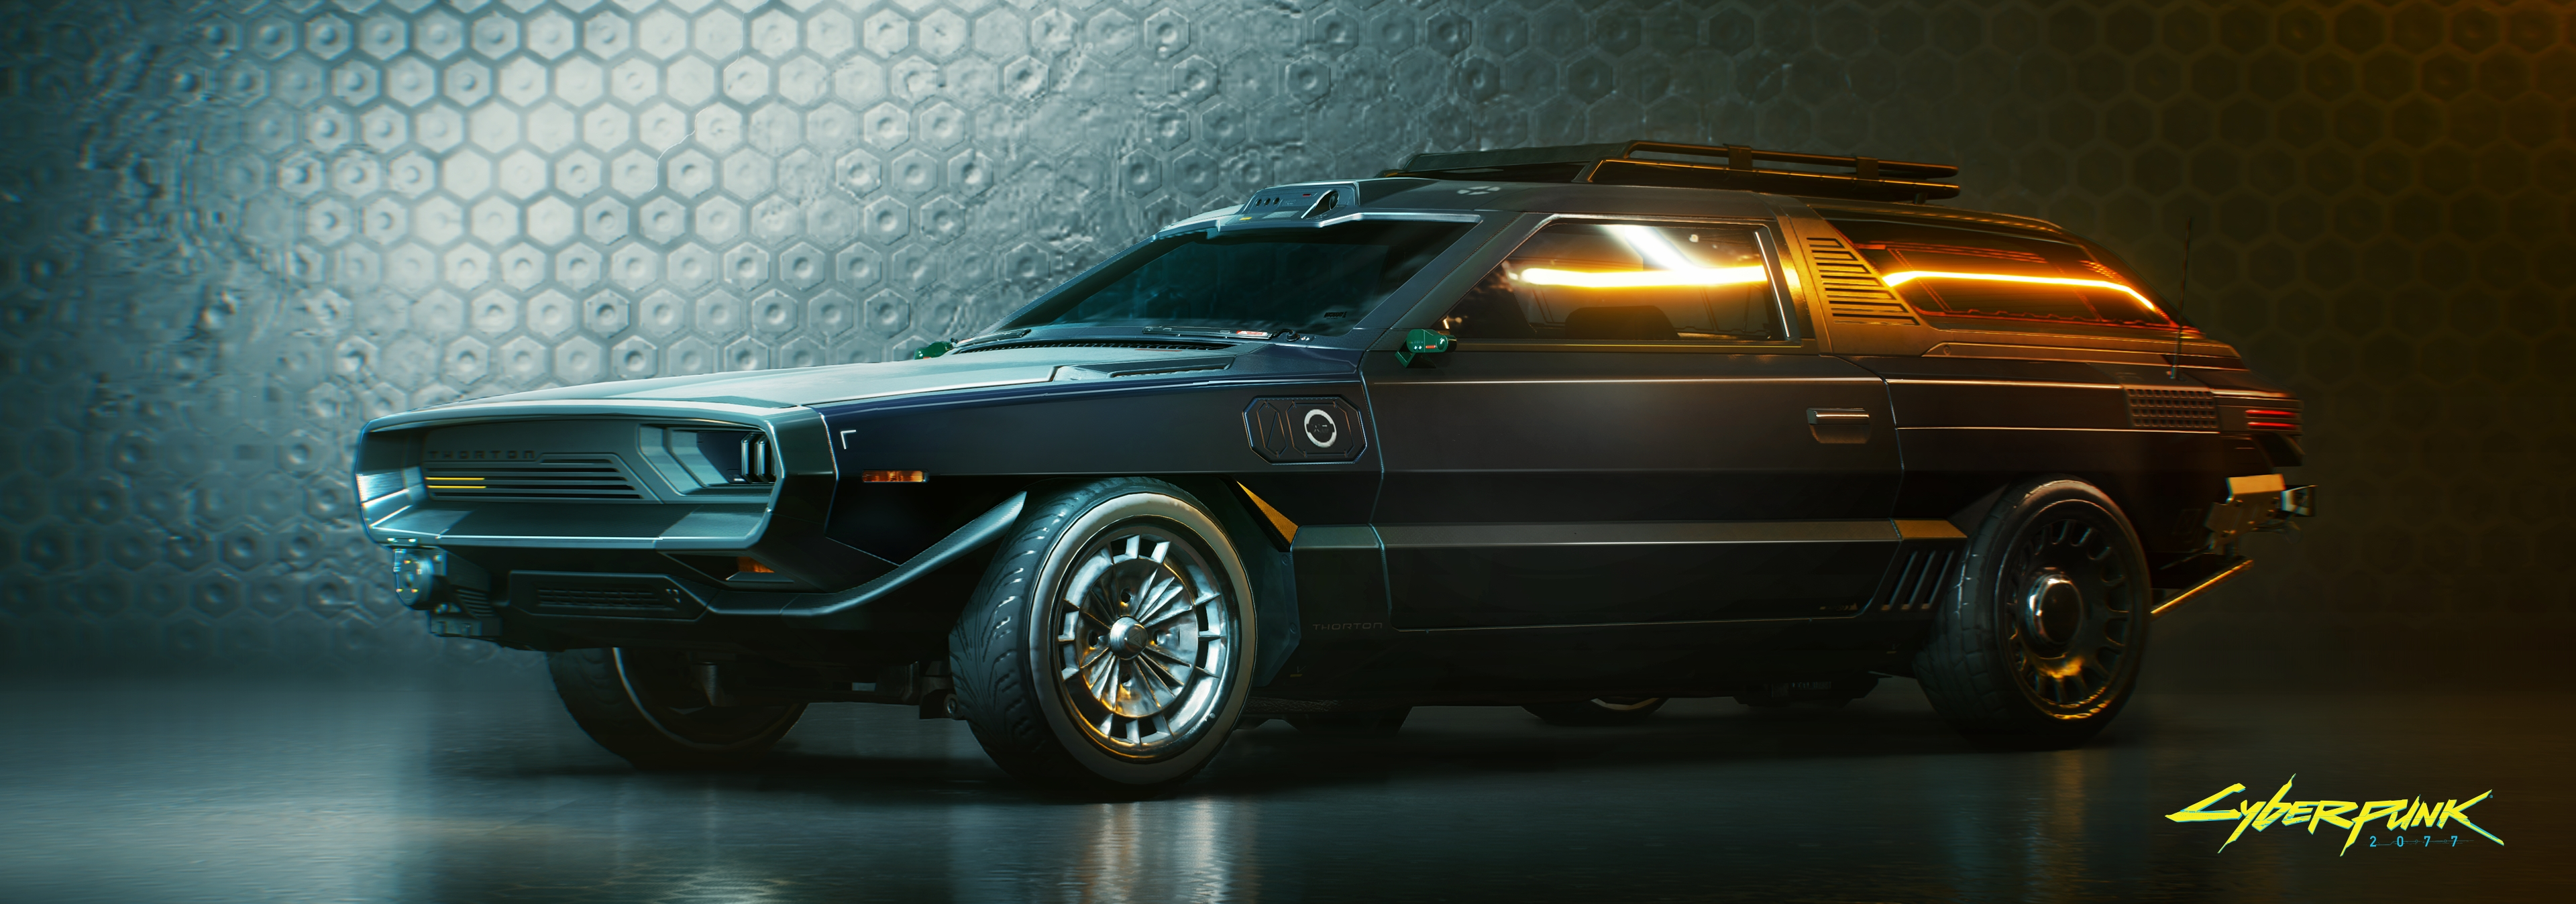 Транспорт - Cyberpunk 2077